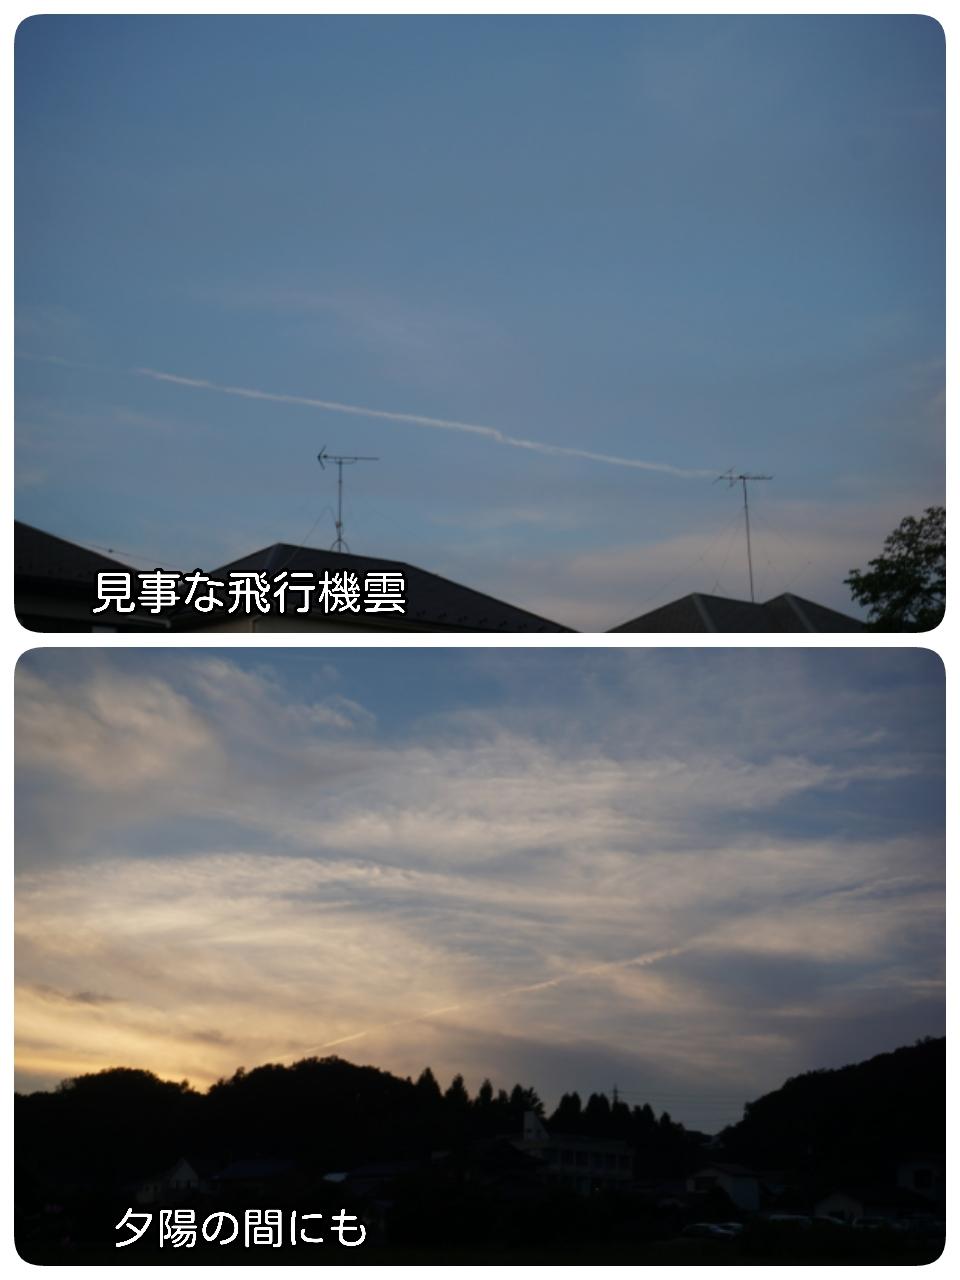 15-09-25-13-16-12-793_deco.jpg